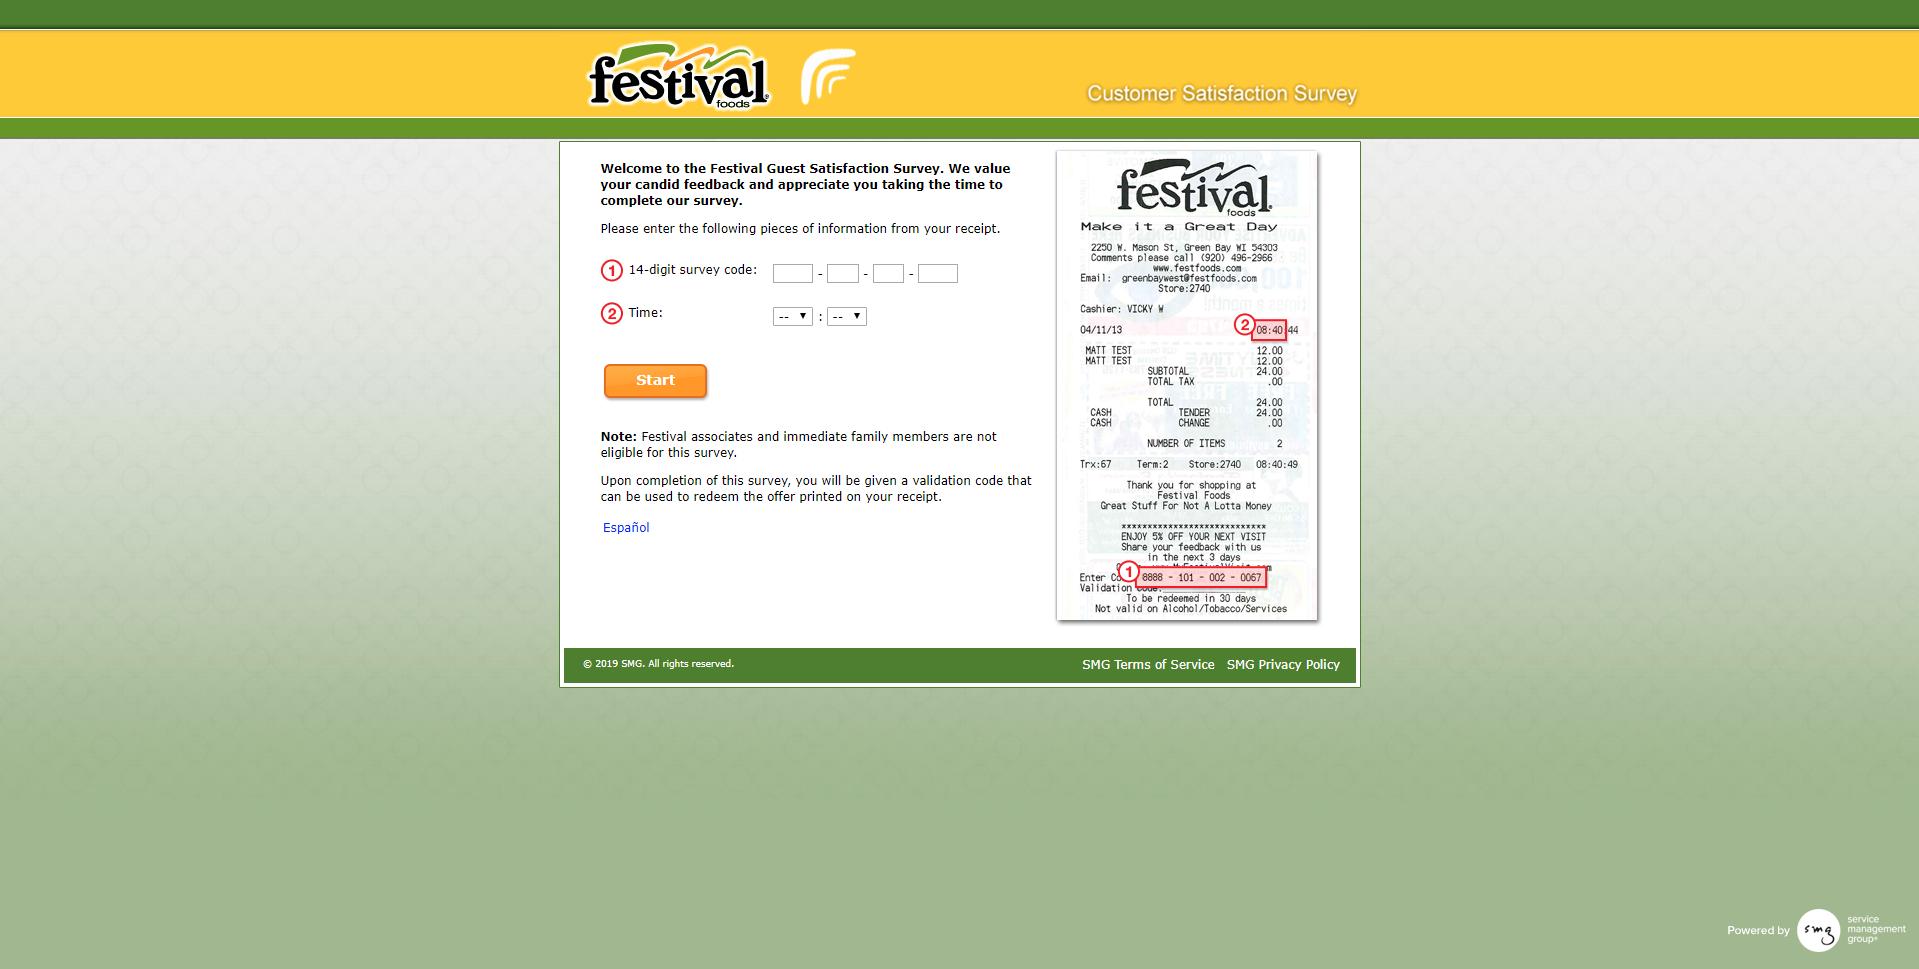 www.myfestivalvisit.com